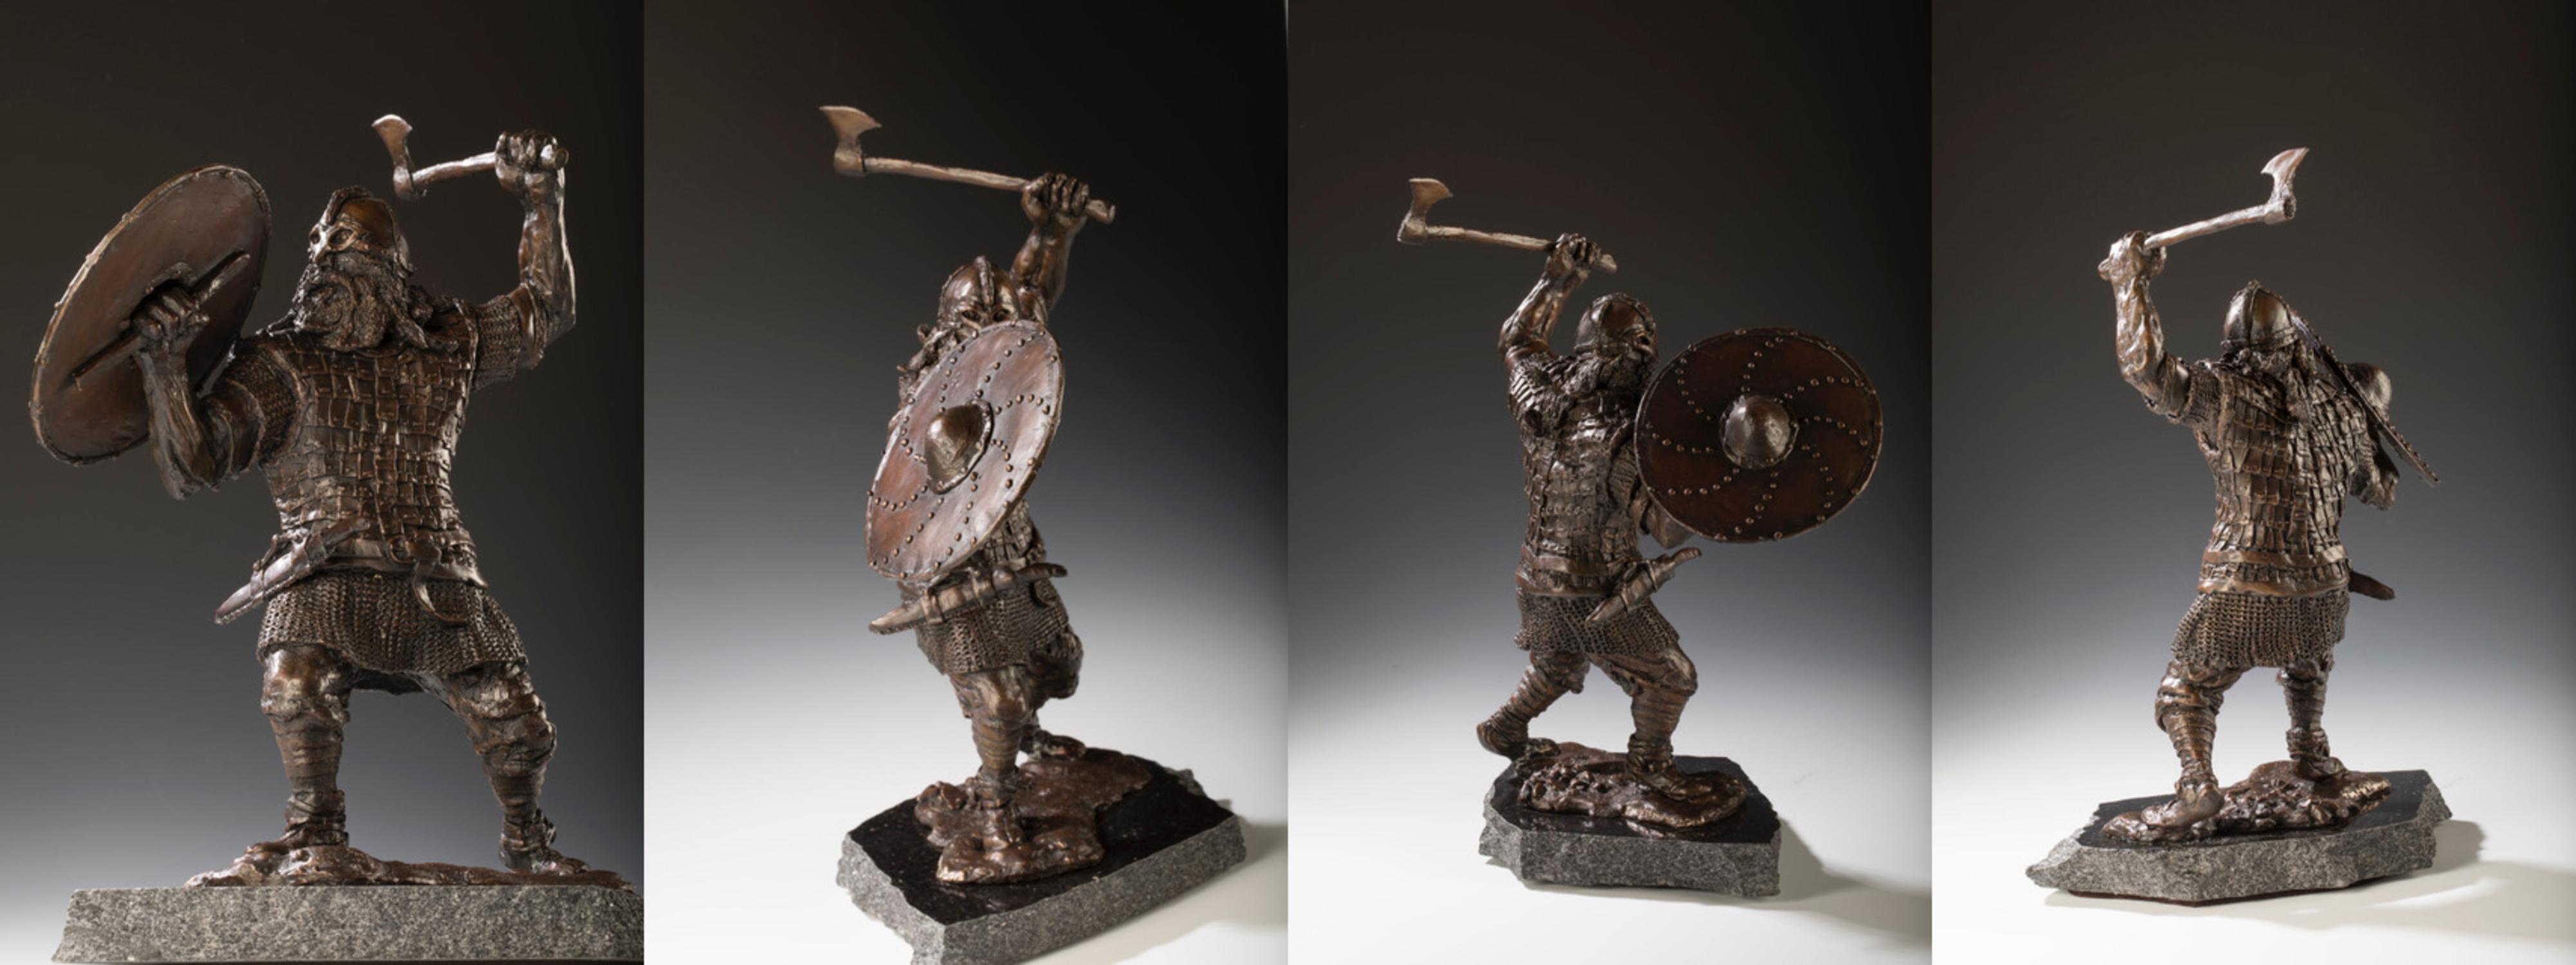 The Saxon Artwork by james herrmann